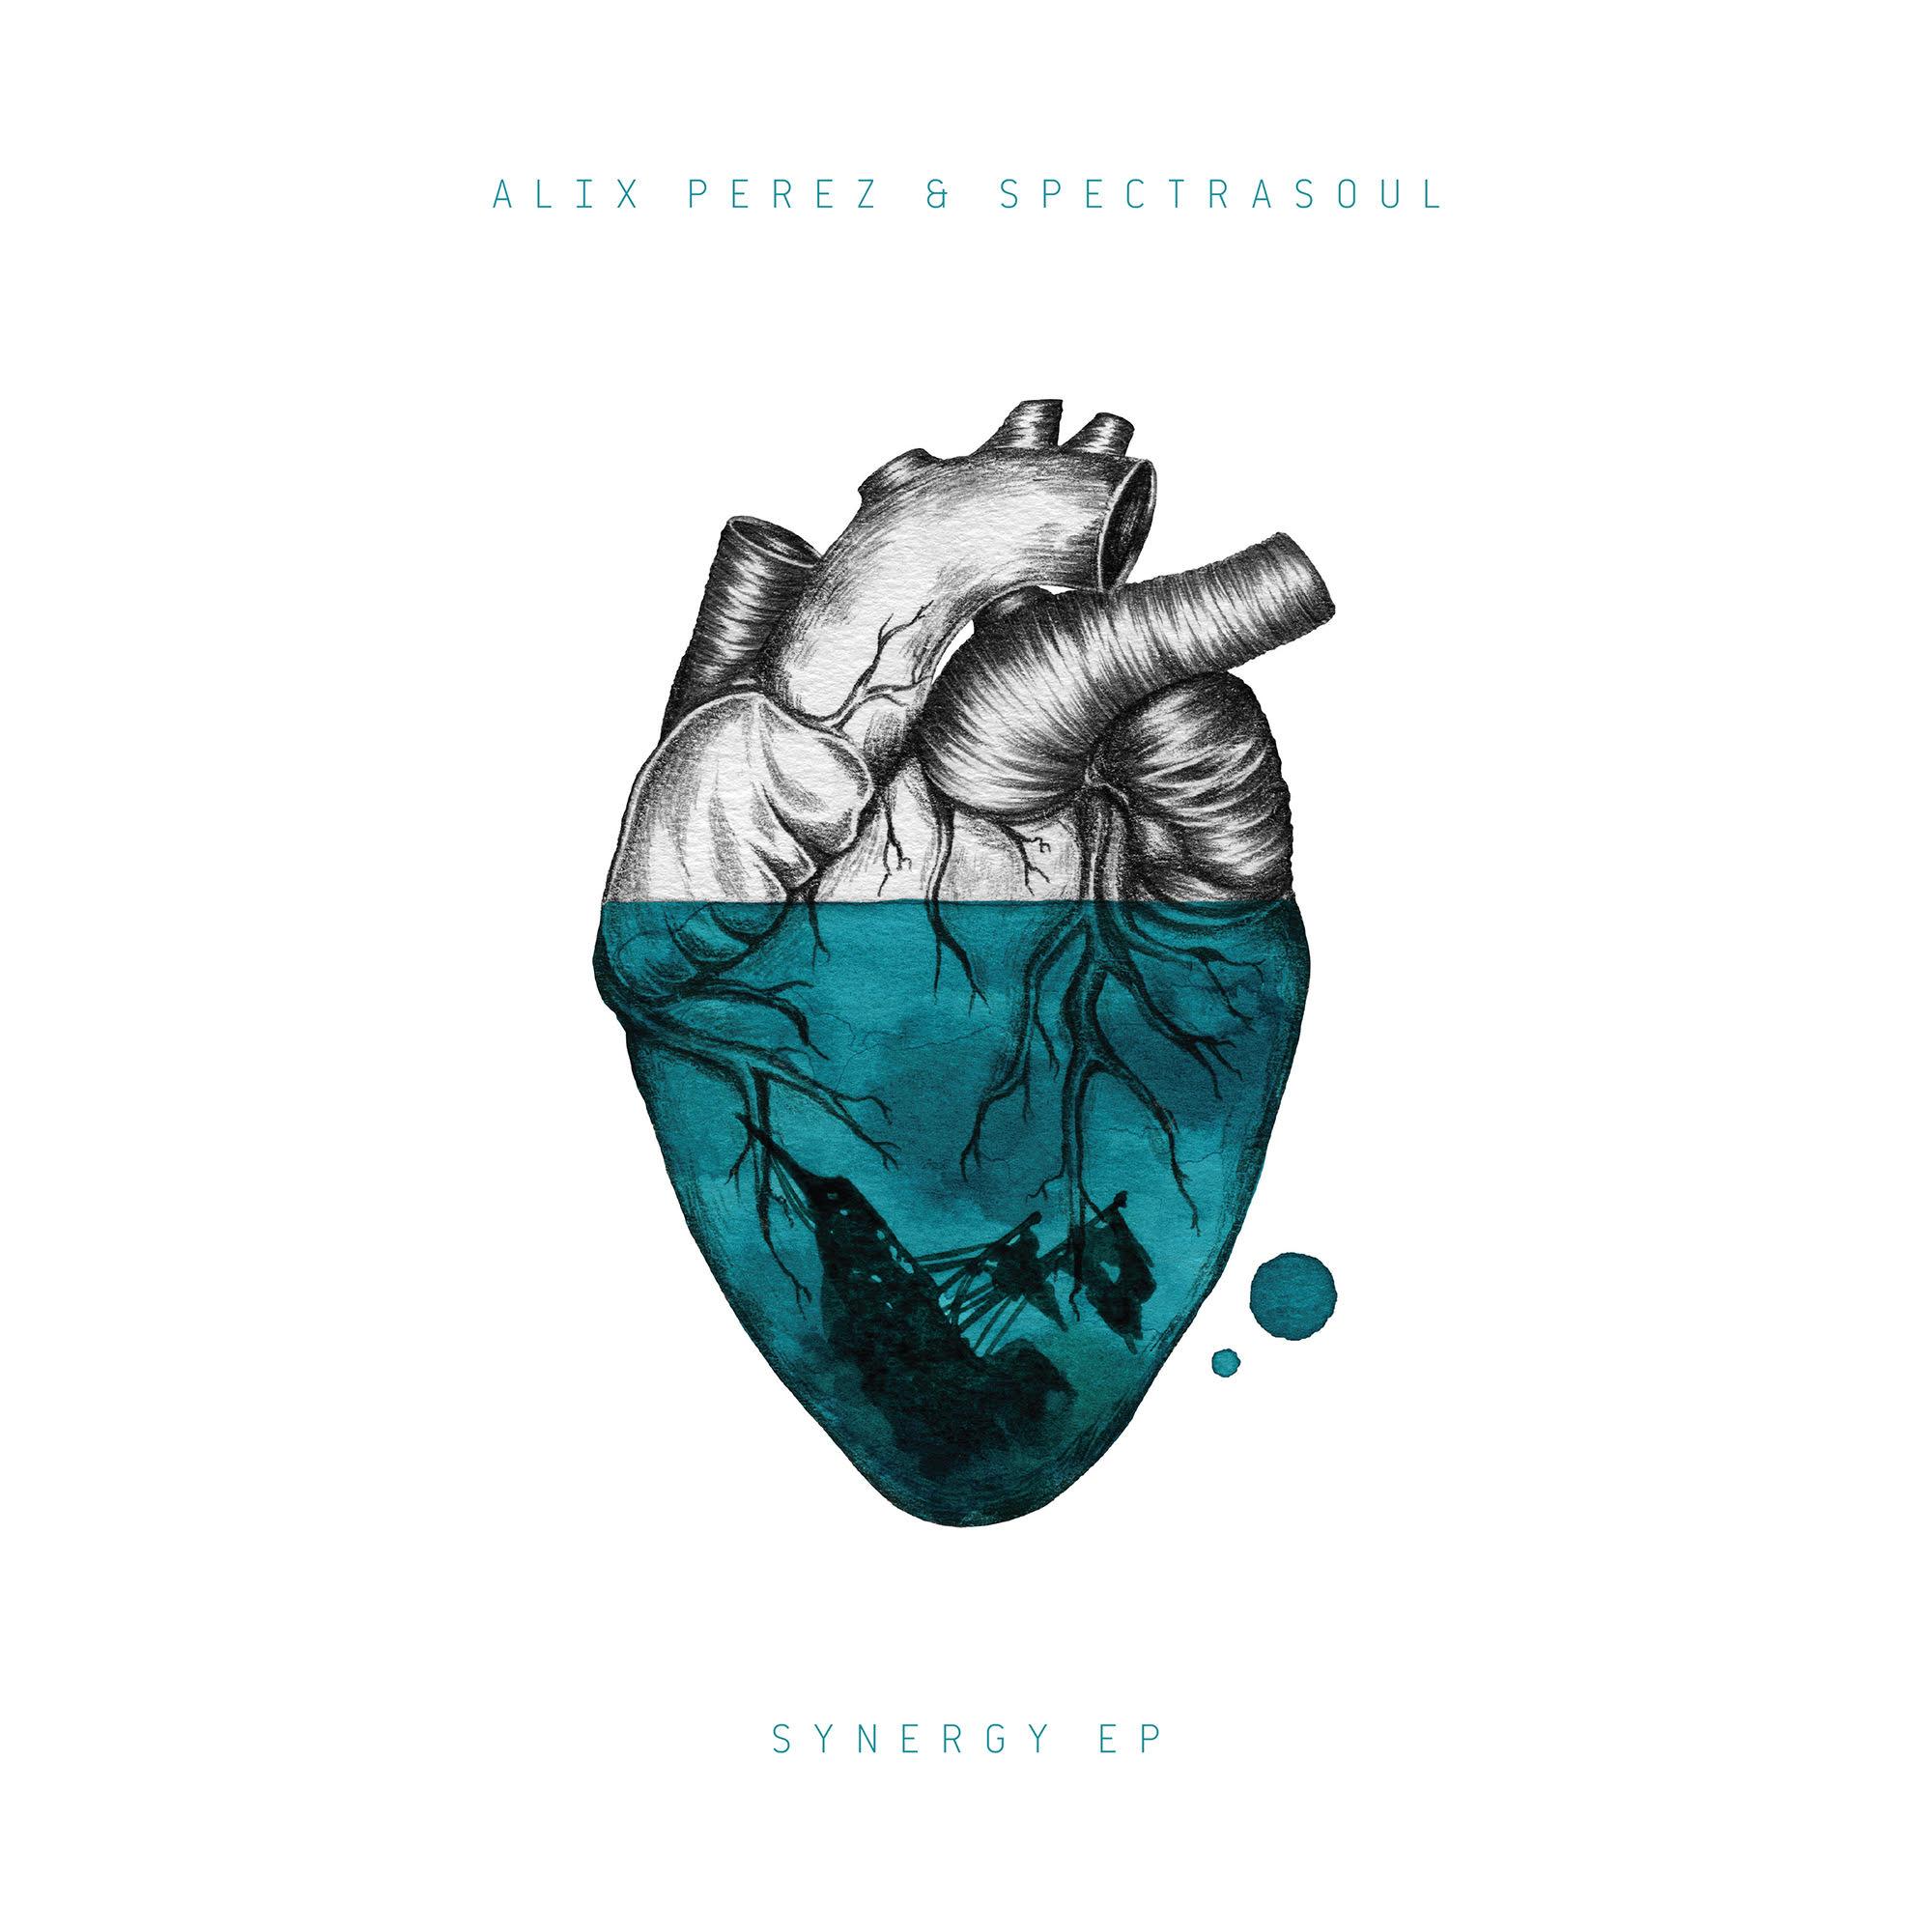 Alix Perez & Spectrasoul - Synergy EP